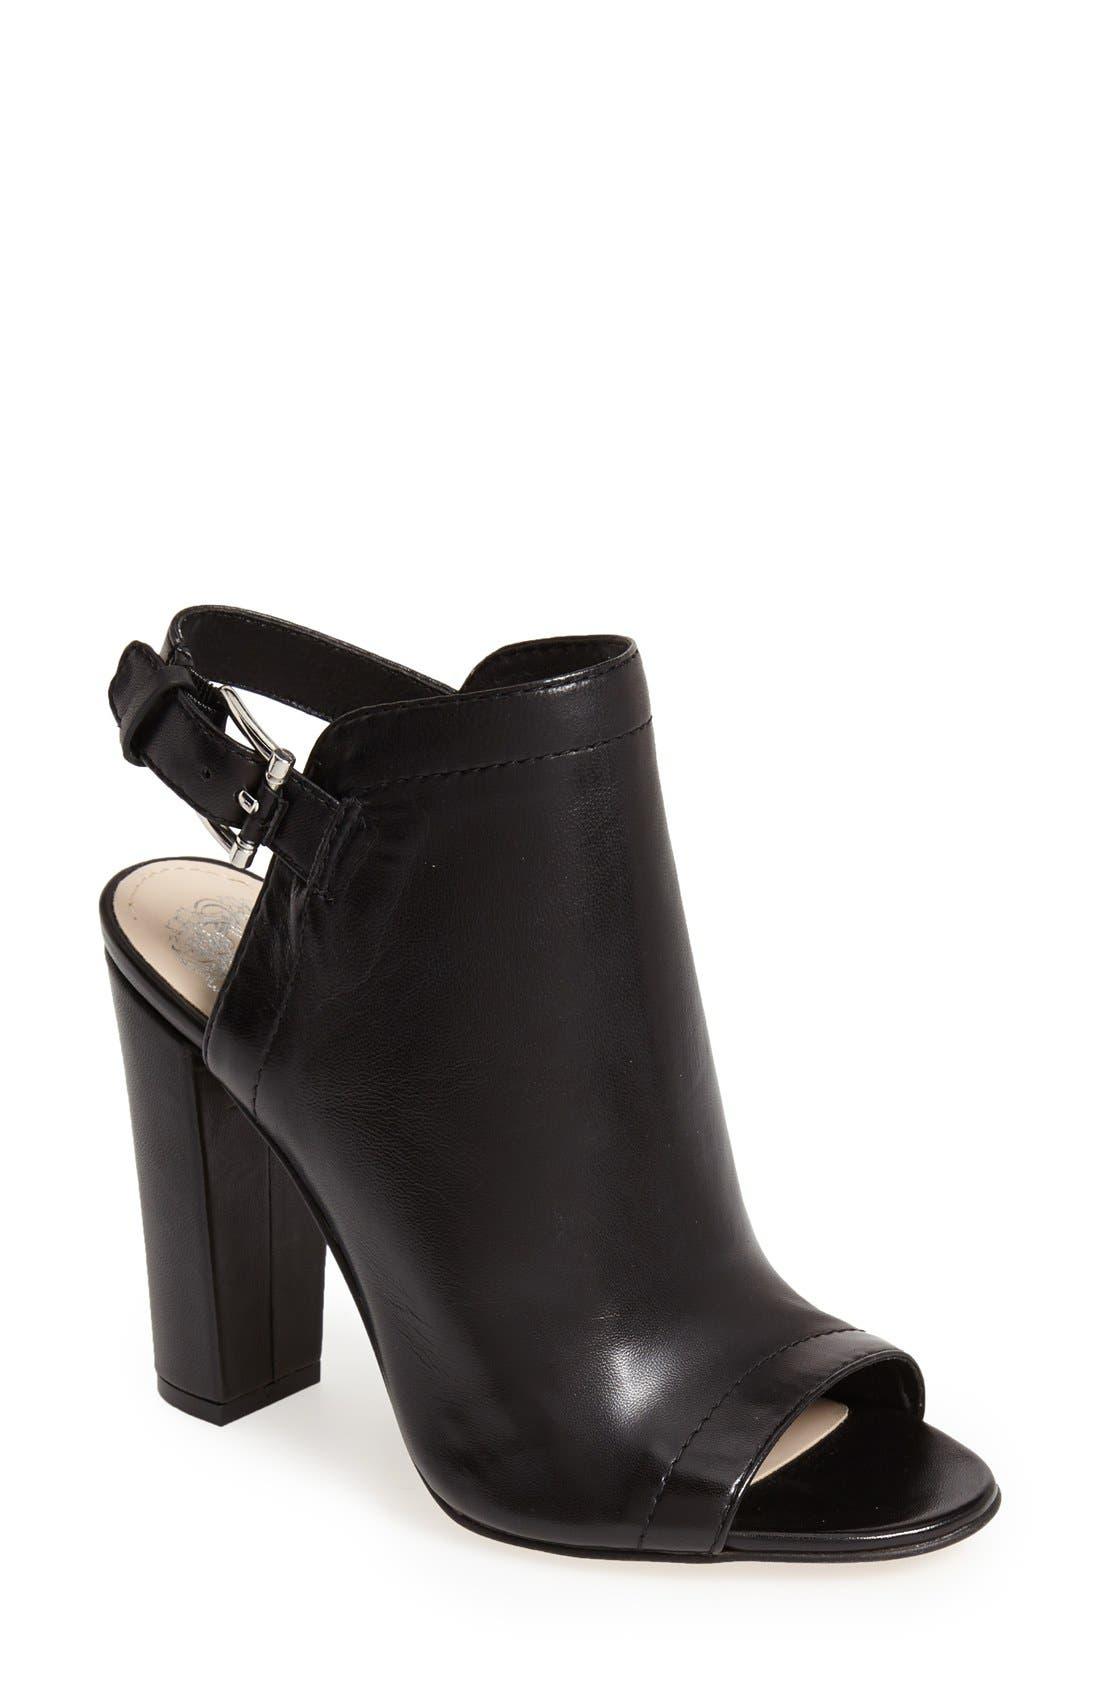 Alternate Image 1 Selected - Vince Camuto 'Vamelia' Open Toe Leather Bootie (Women)